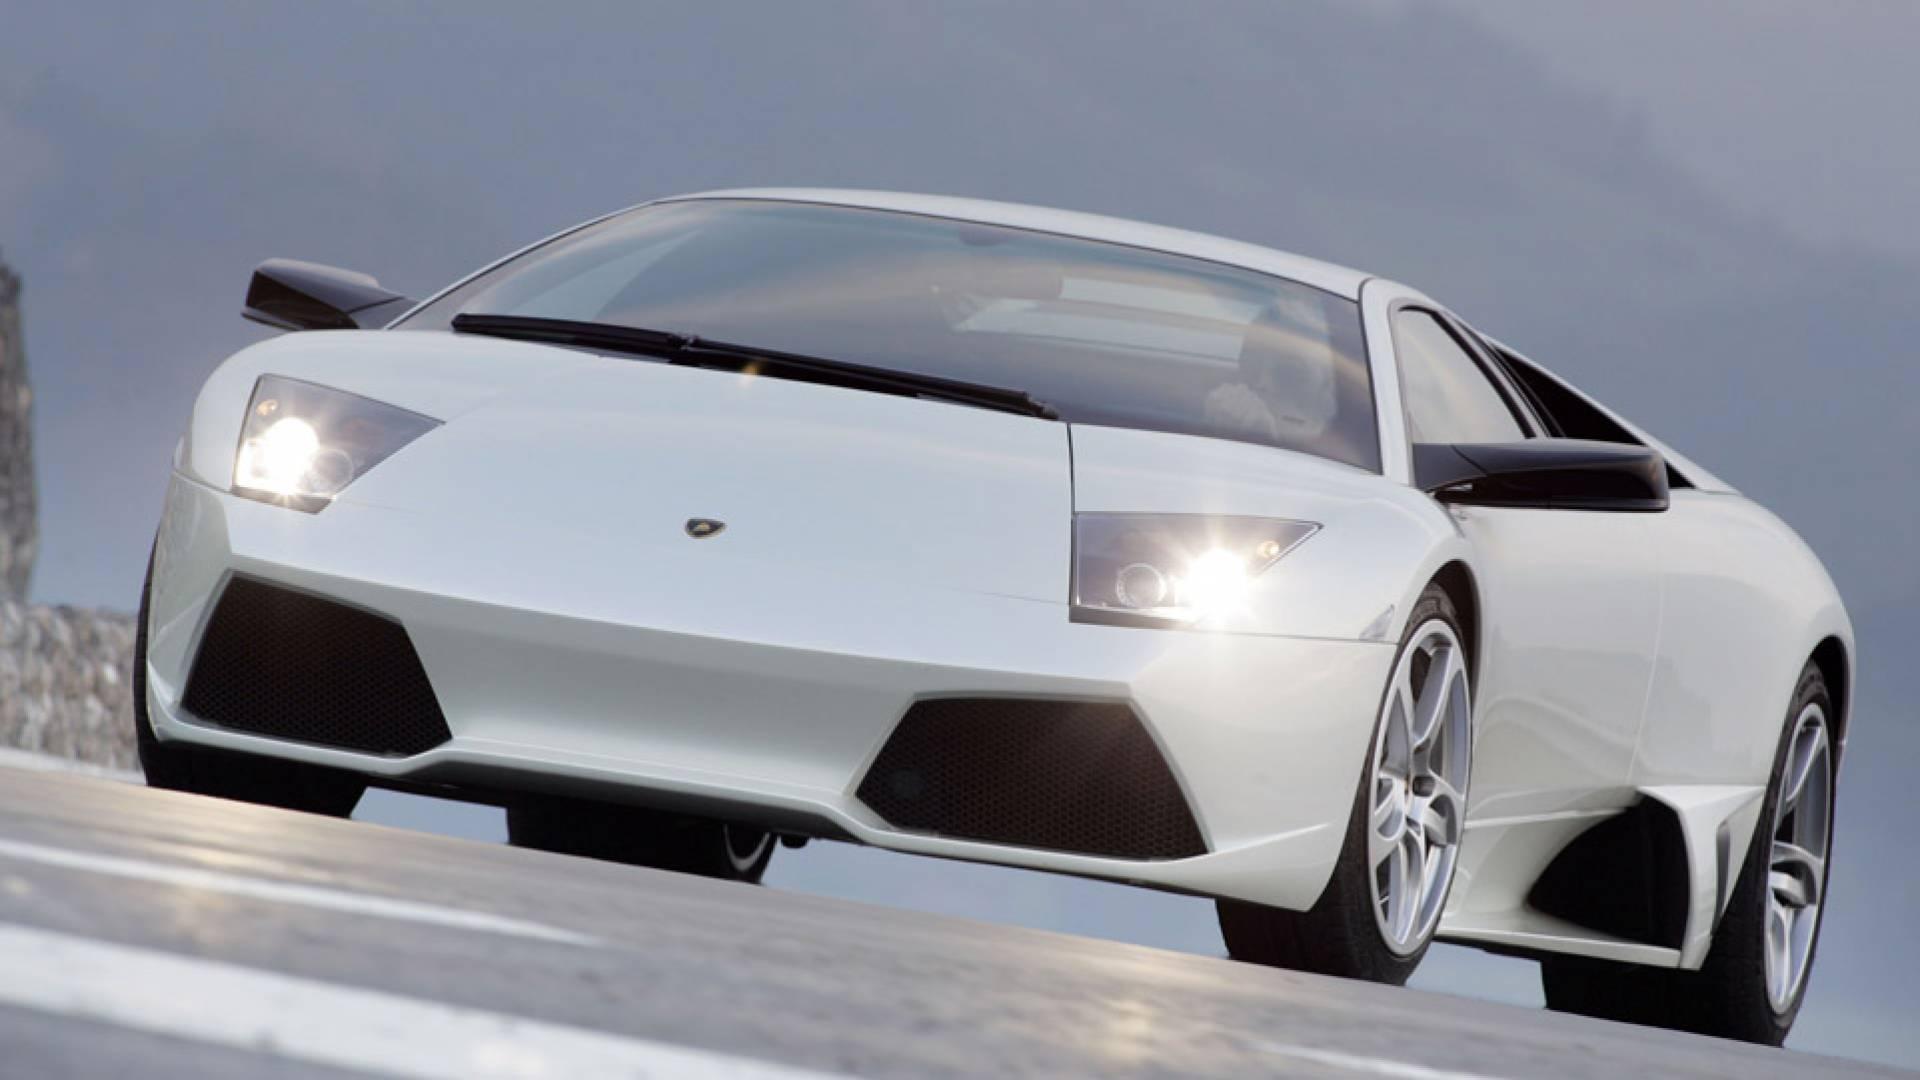 Lamborghini Murcielago Y Murcielago Sv Precios Prueba Ficha